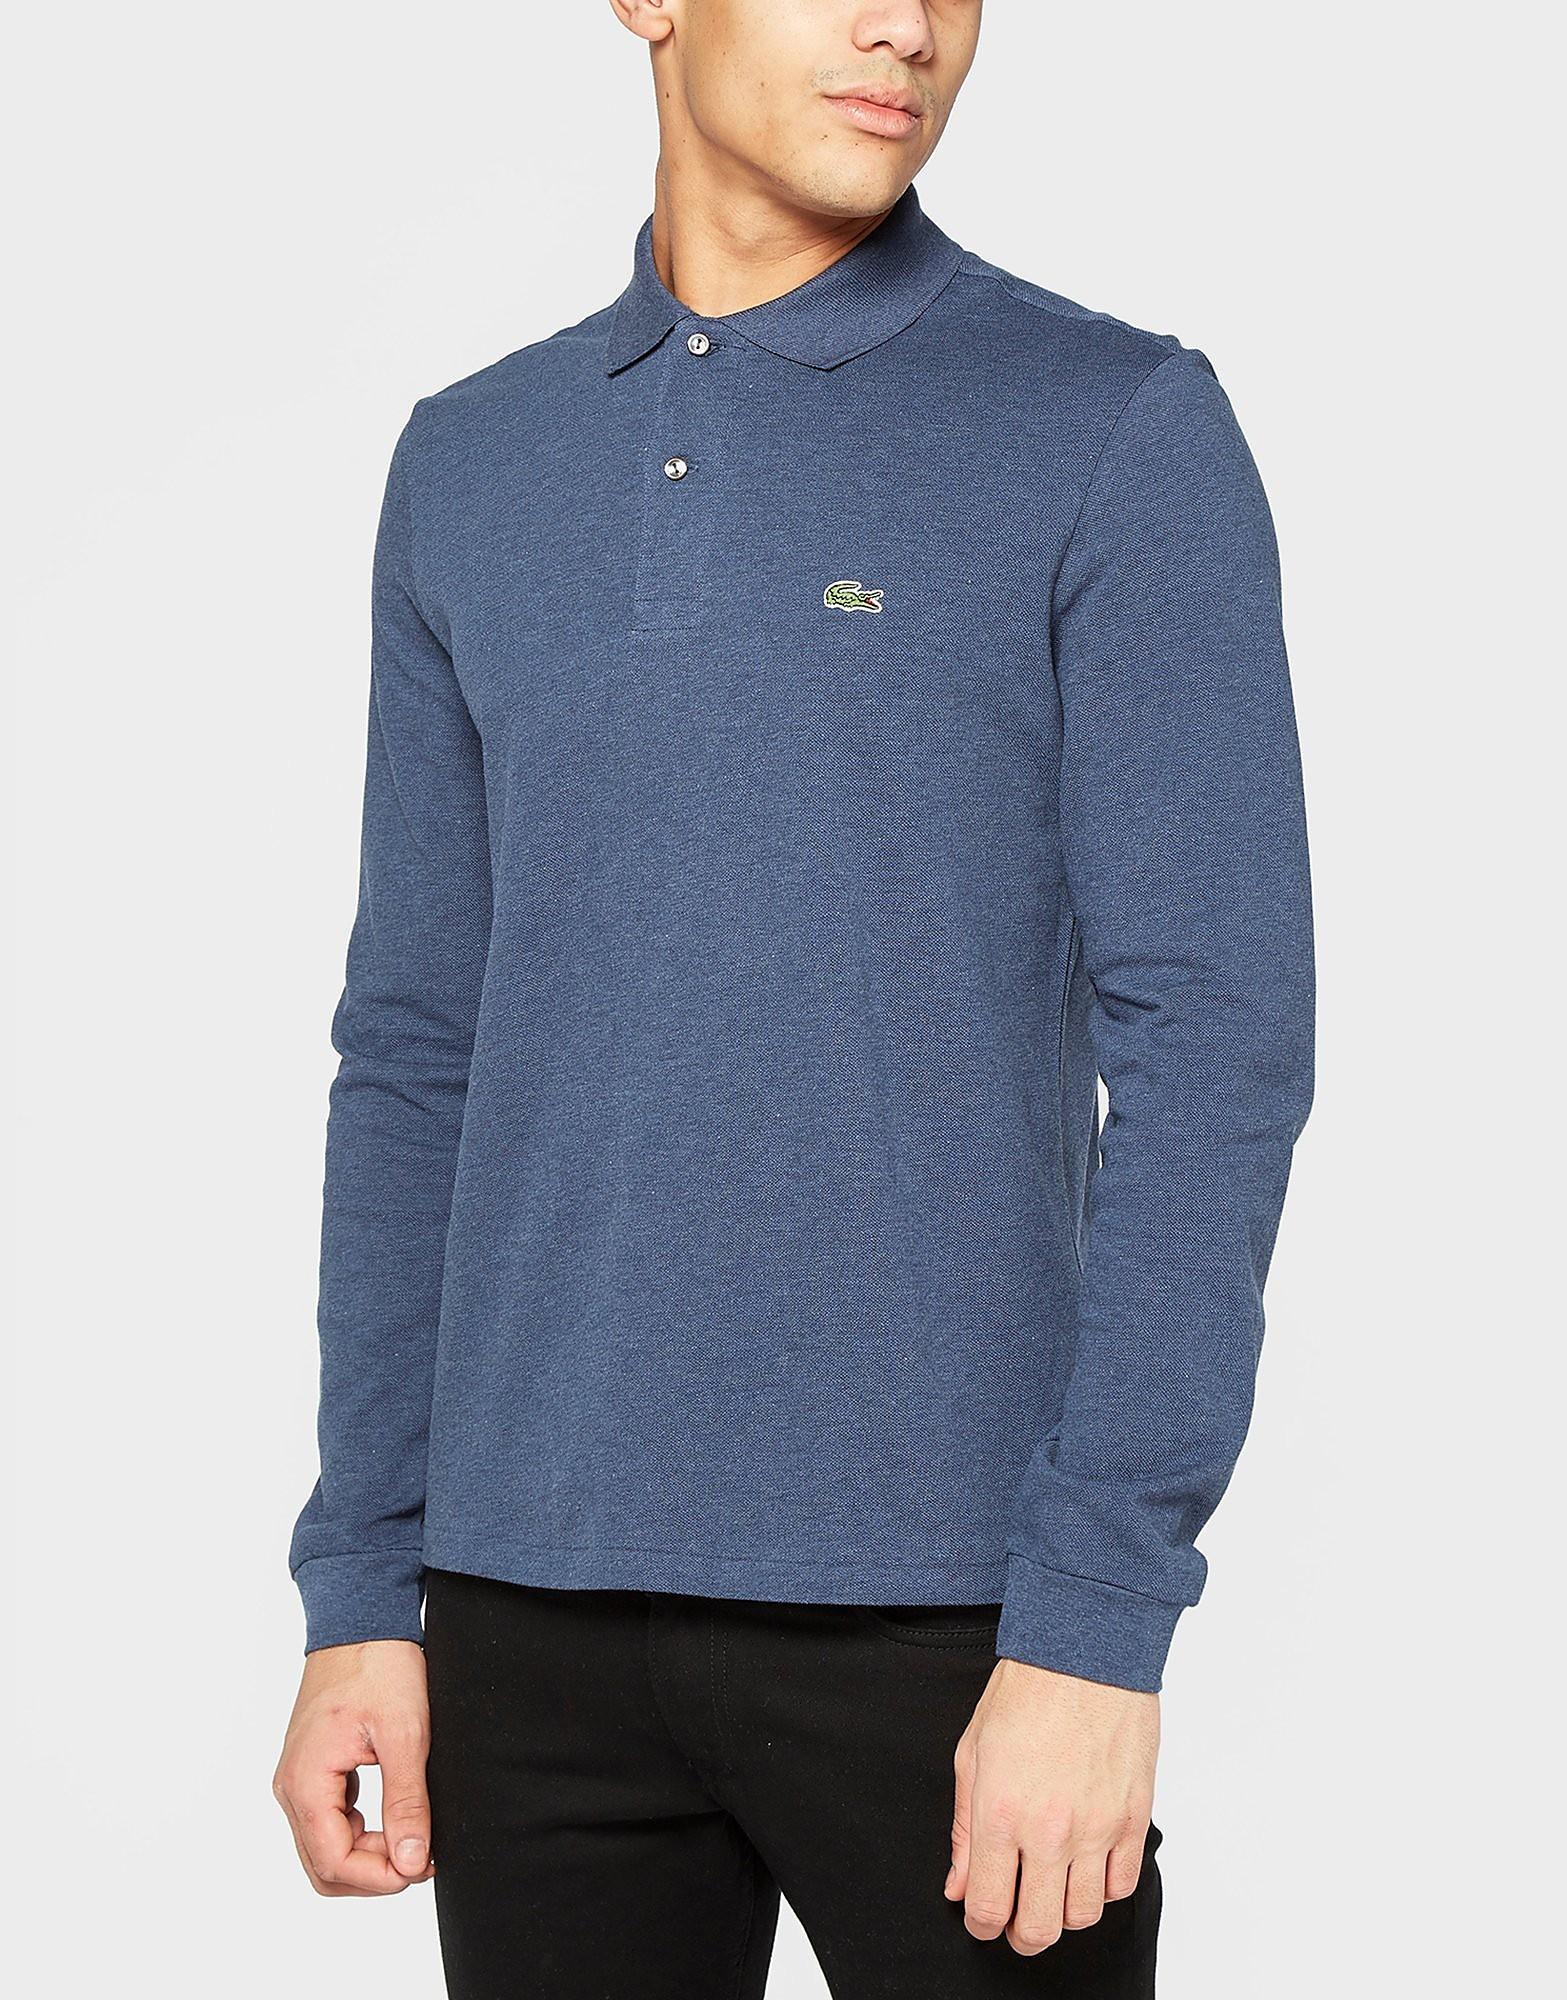 Lacoste L1313 Polo Shirt